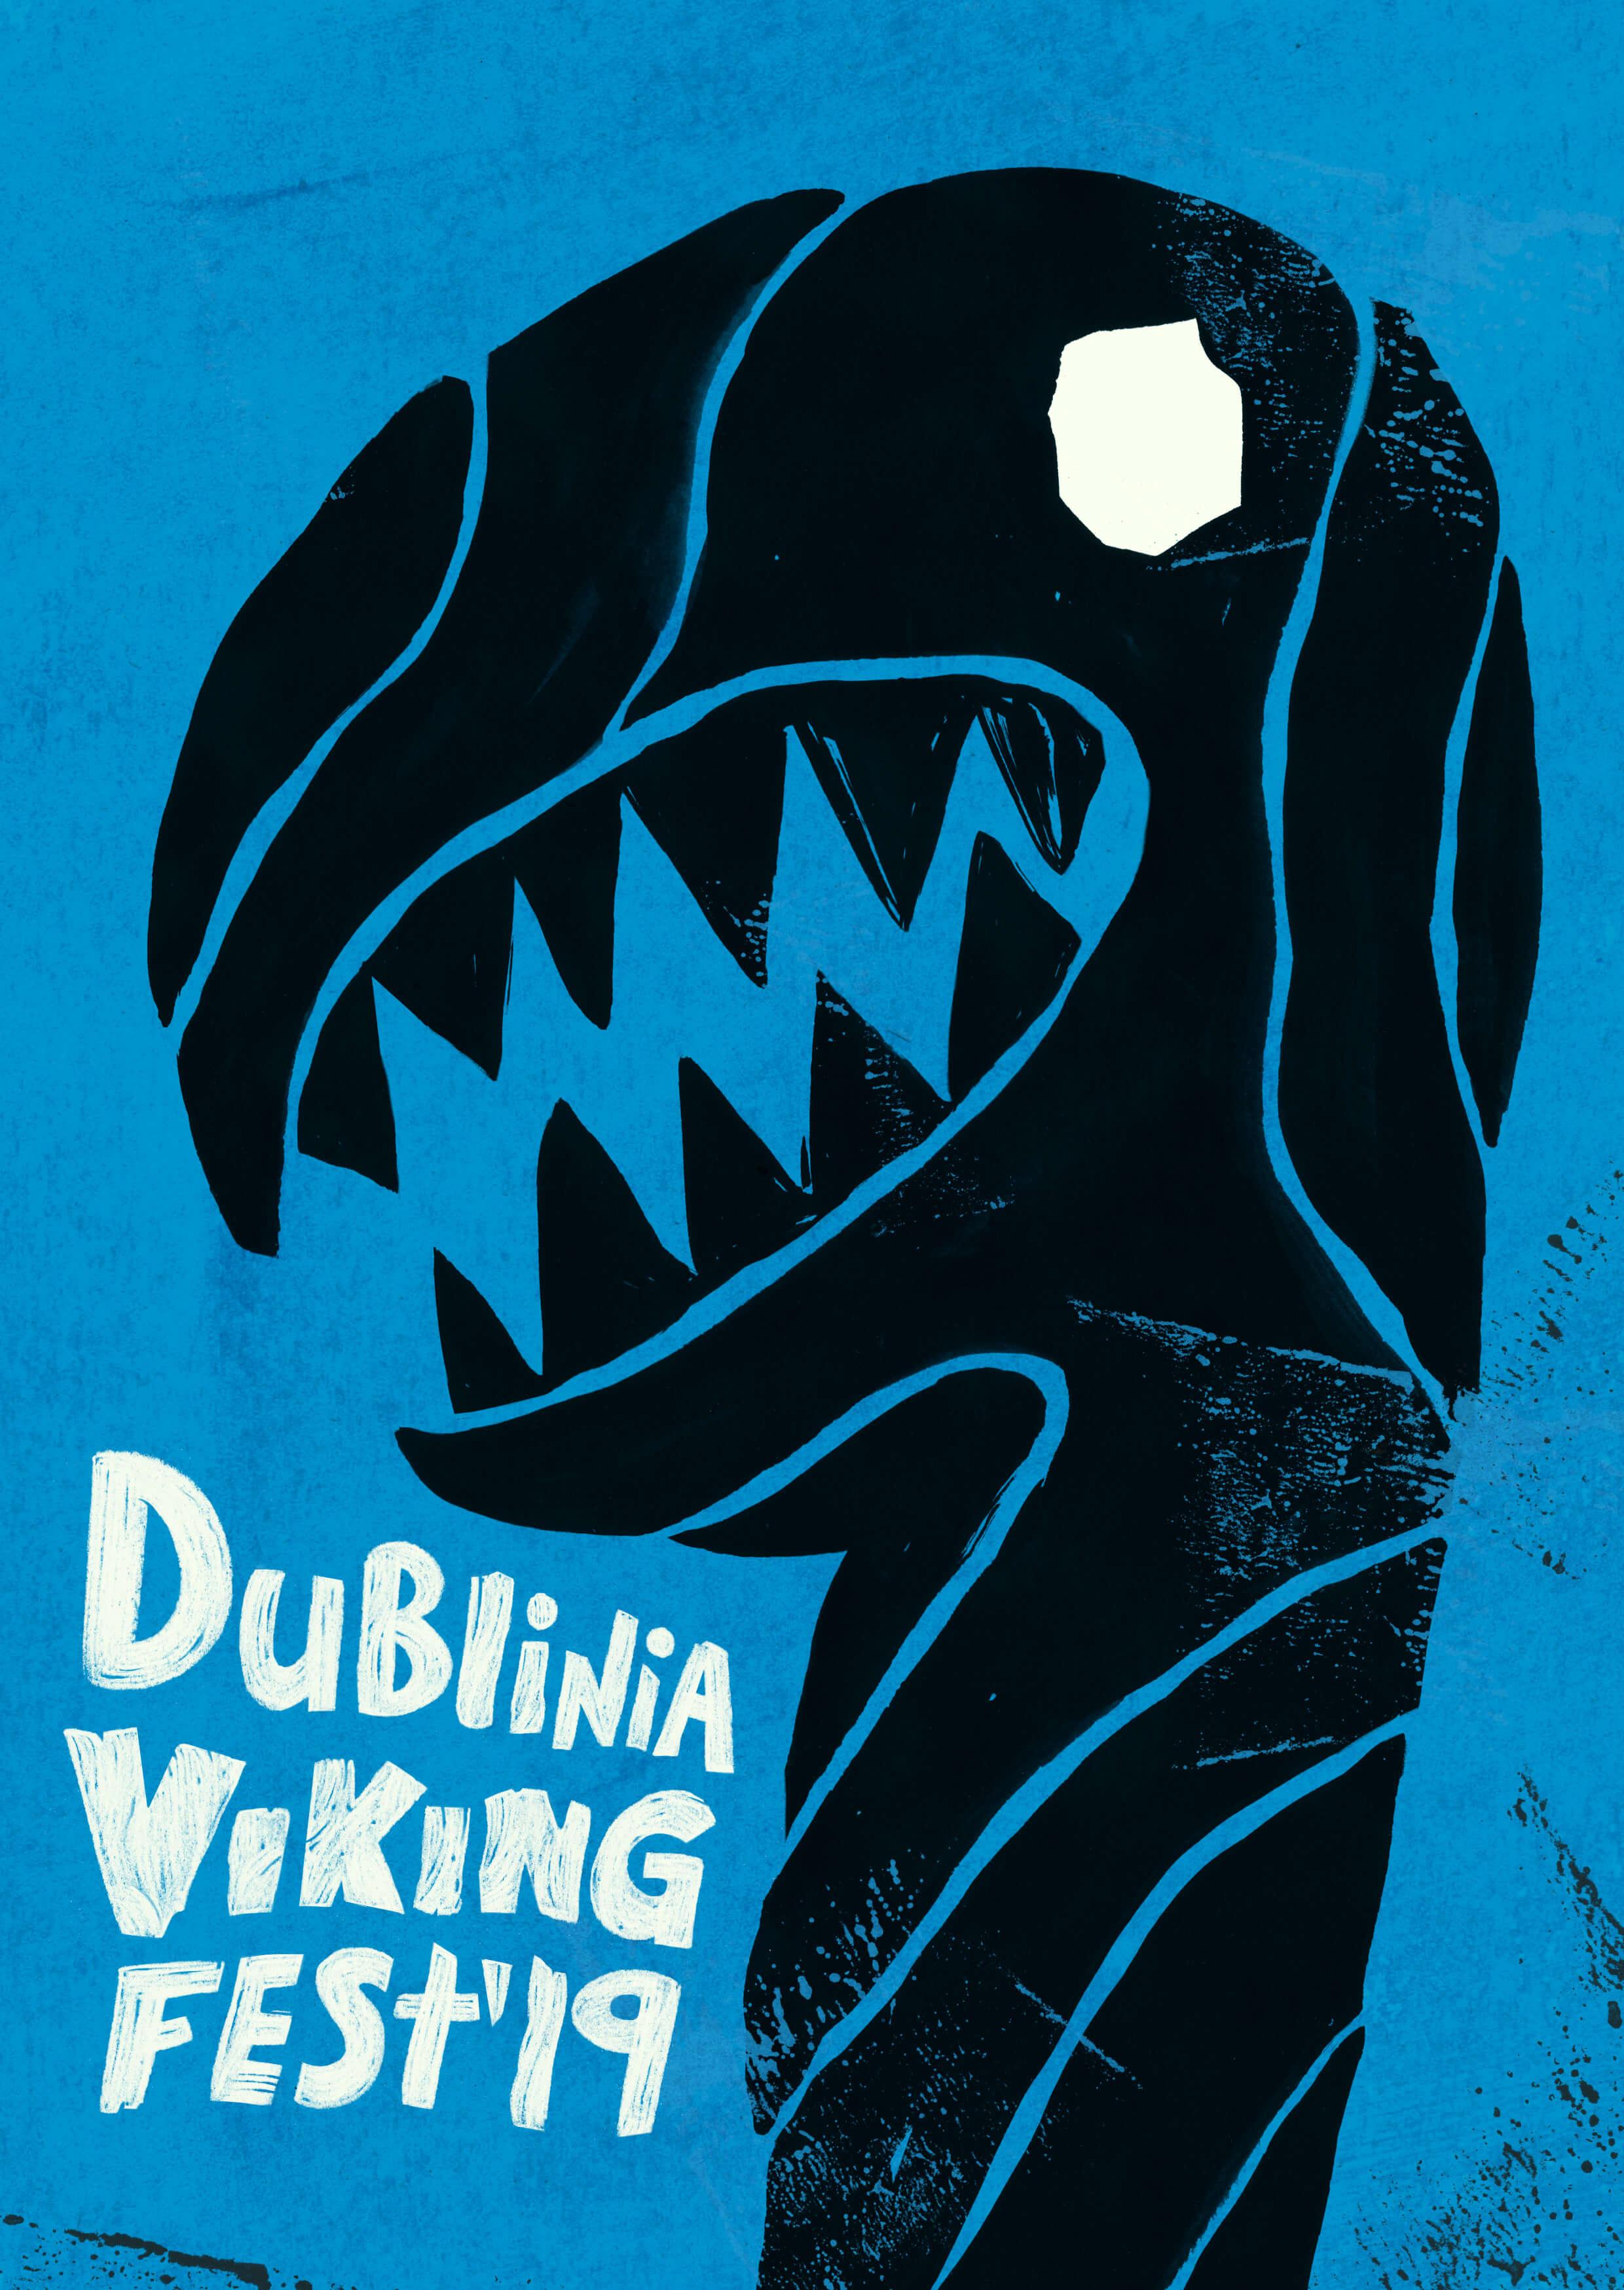 Dublinia Viking Fest '19